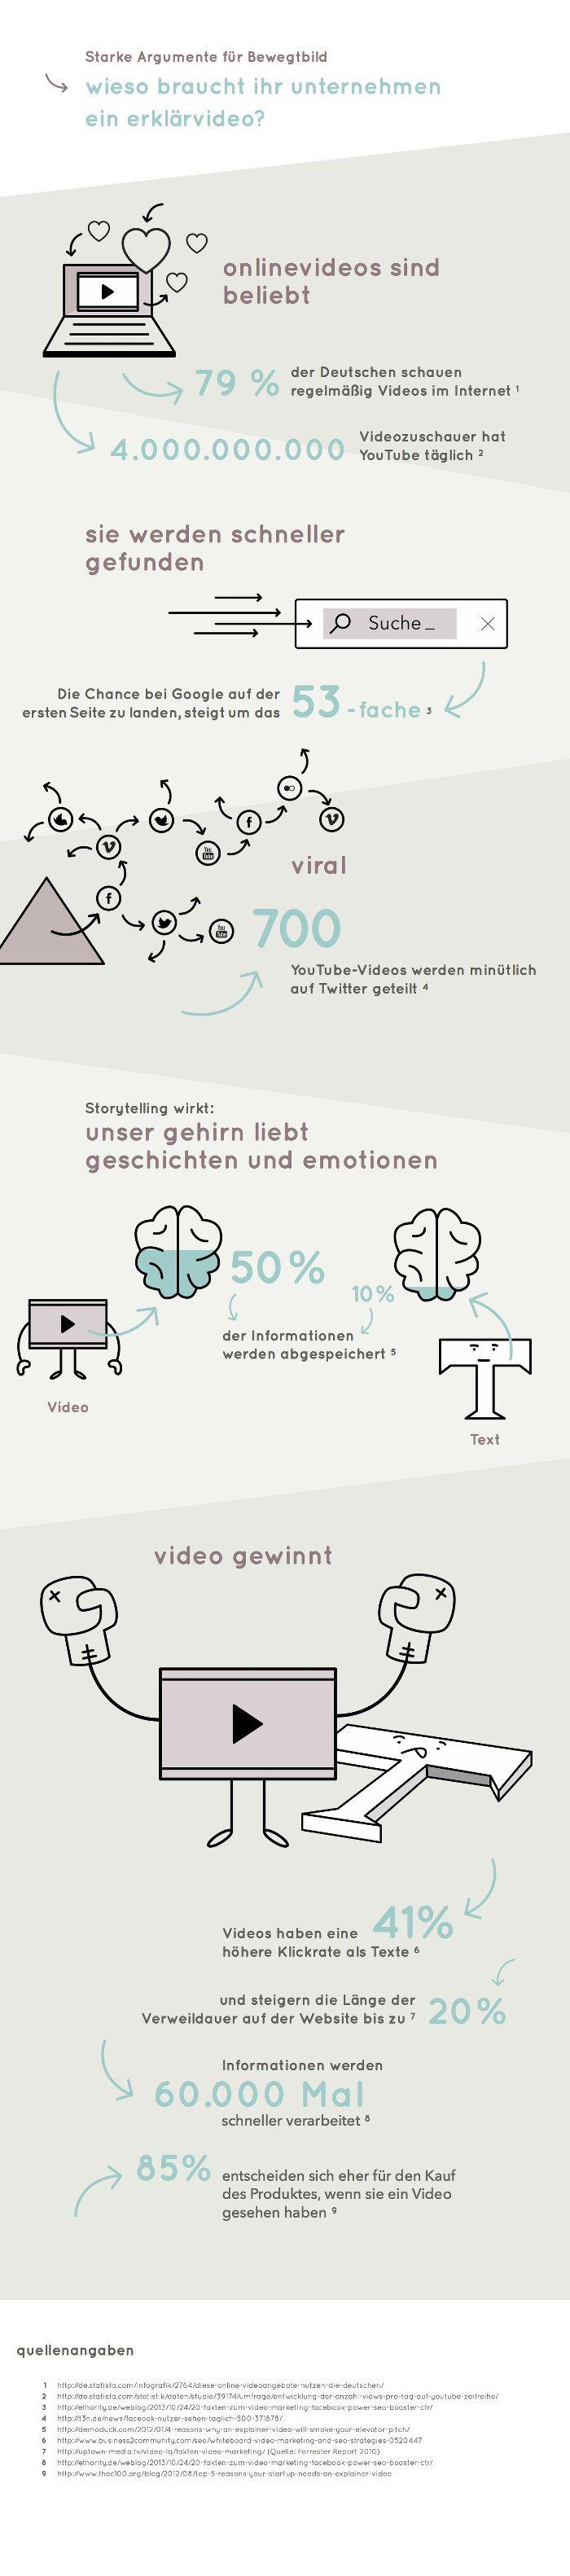 Infografik_ArgumenteBewegtbild